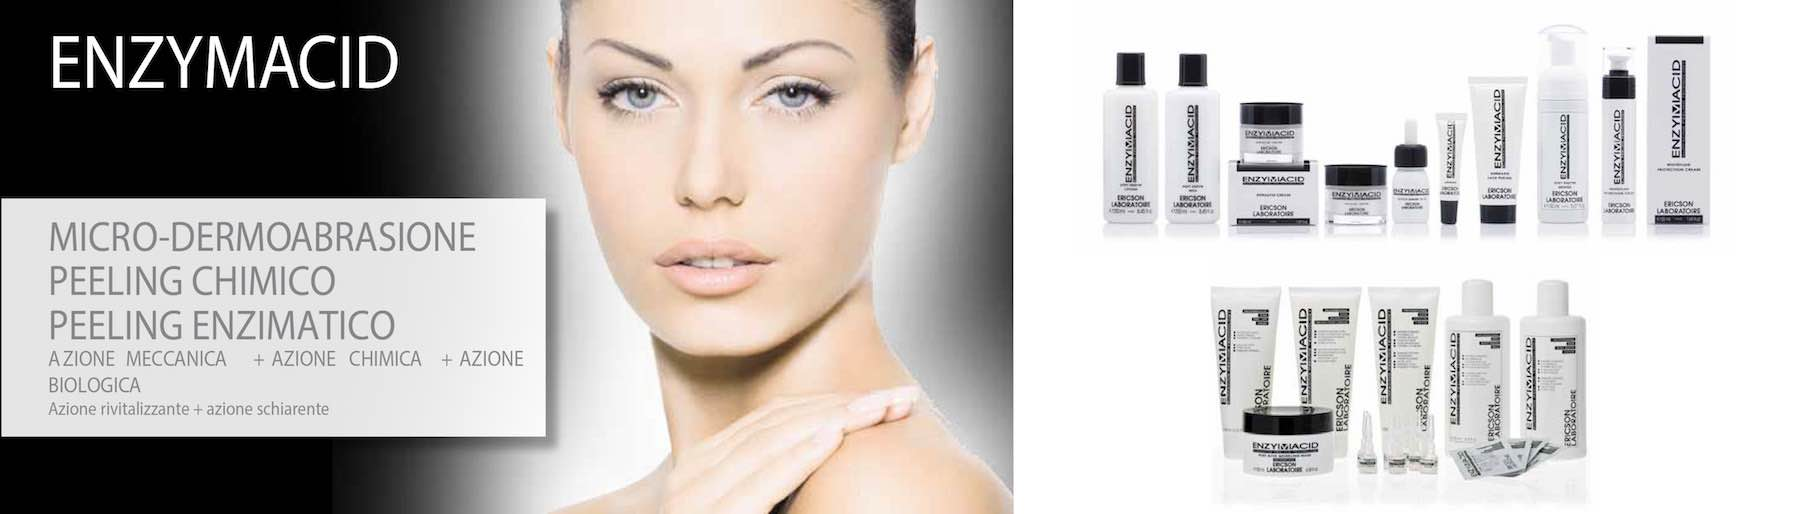 Jerà Beauty - Face-Ericson-Laboratoire-enzymacid